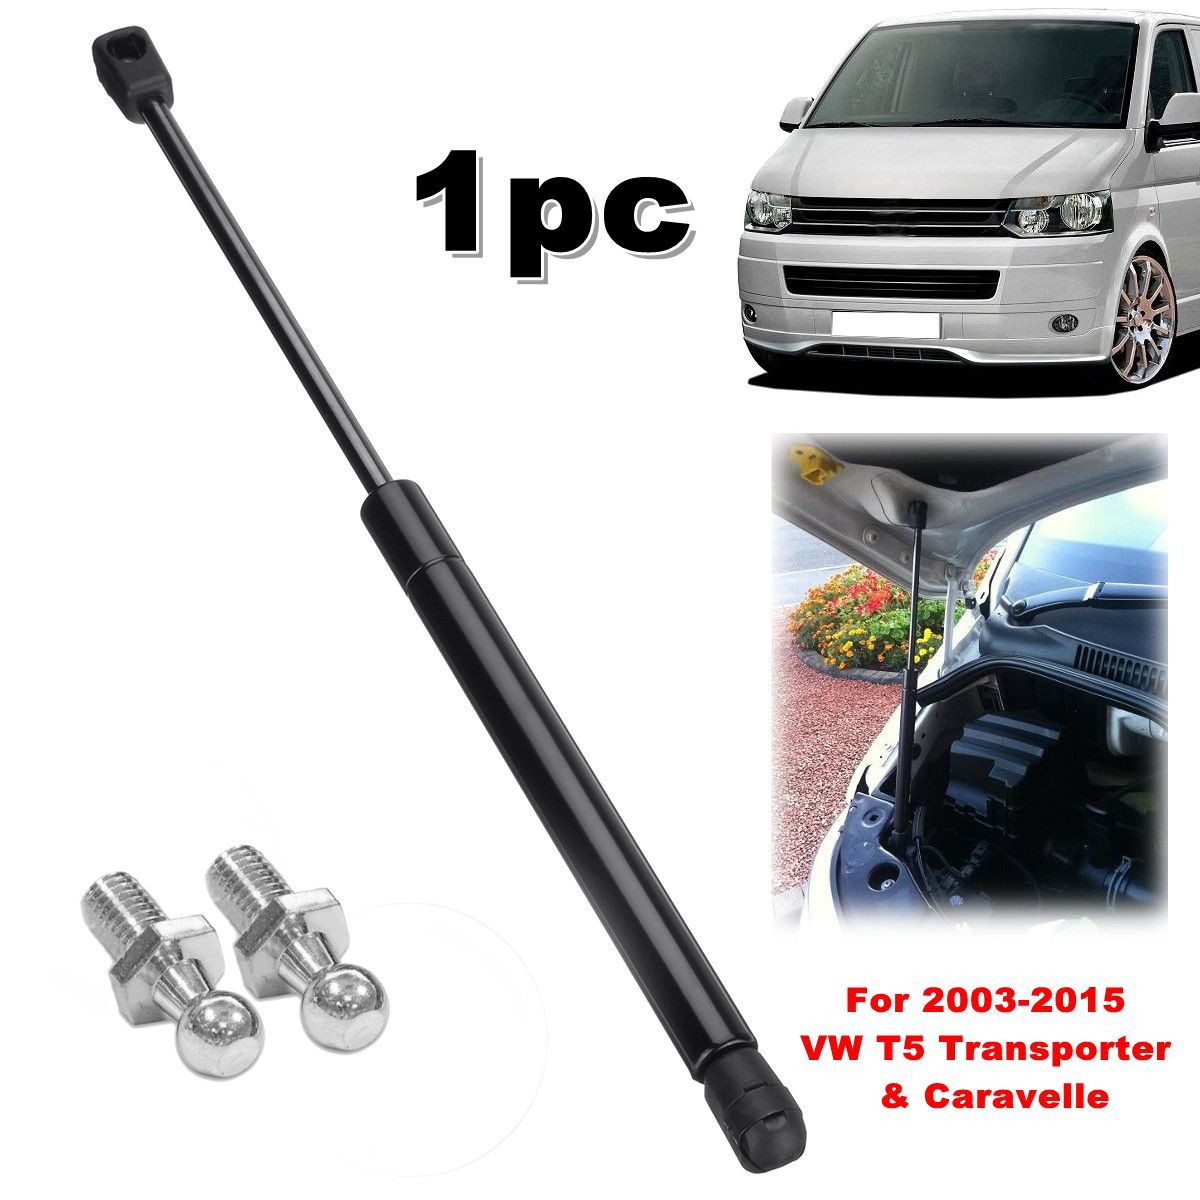 1 PC ด้านหน้า Bonnet Hood รองรับแก๊ส 7E0823359 สำหรับ Volkswagen VW T5 Transporter Caravelle 2003 2004 2005 2006 2007 -2015